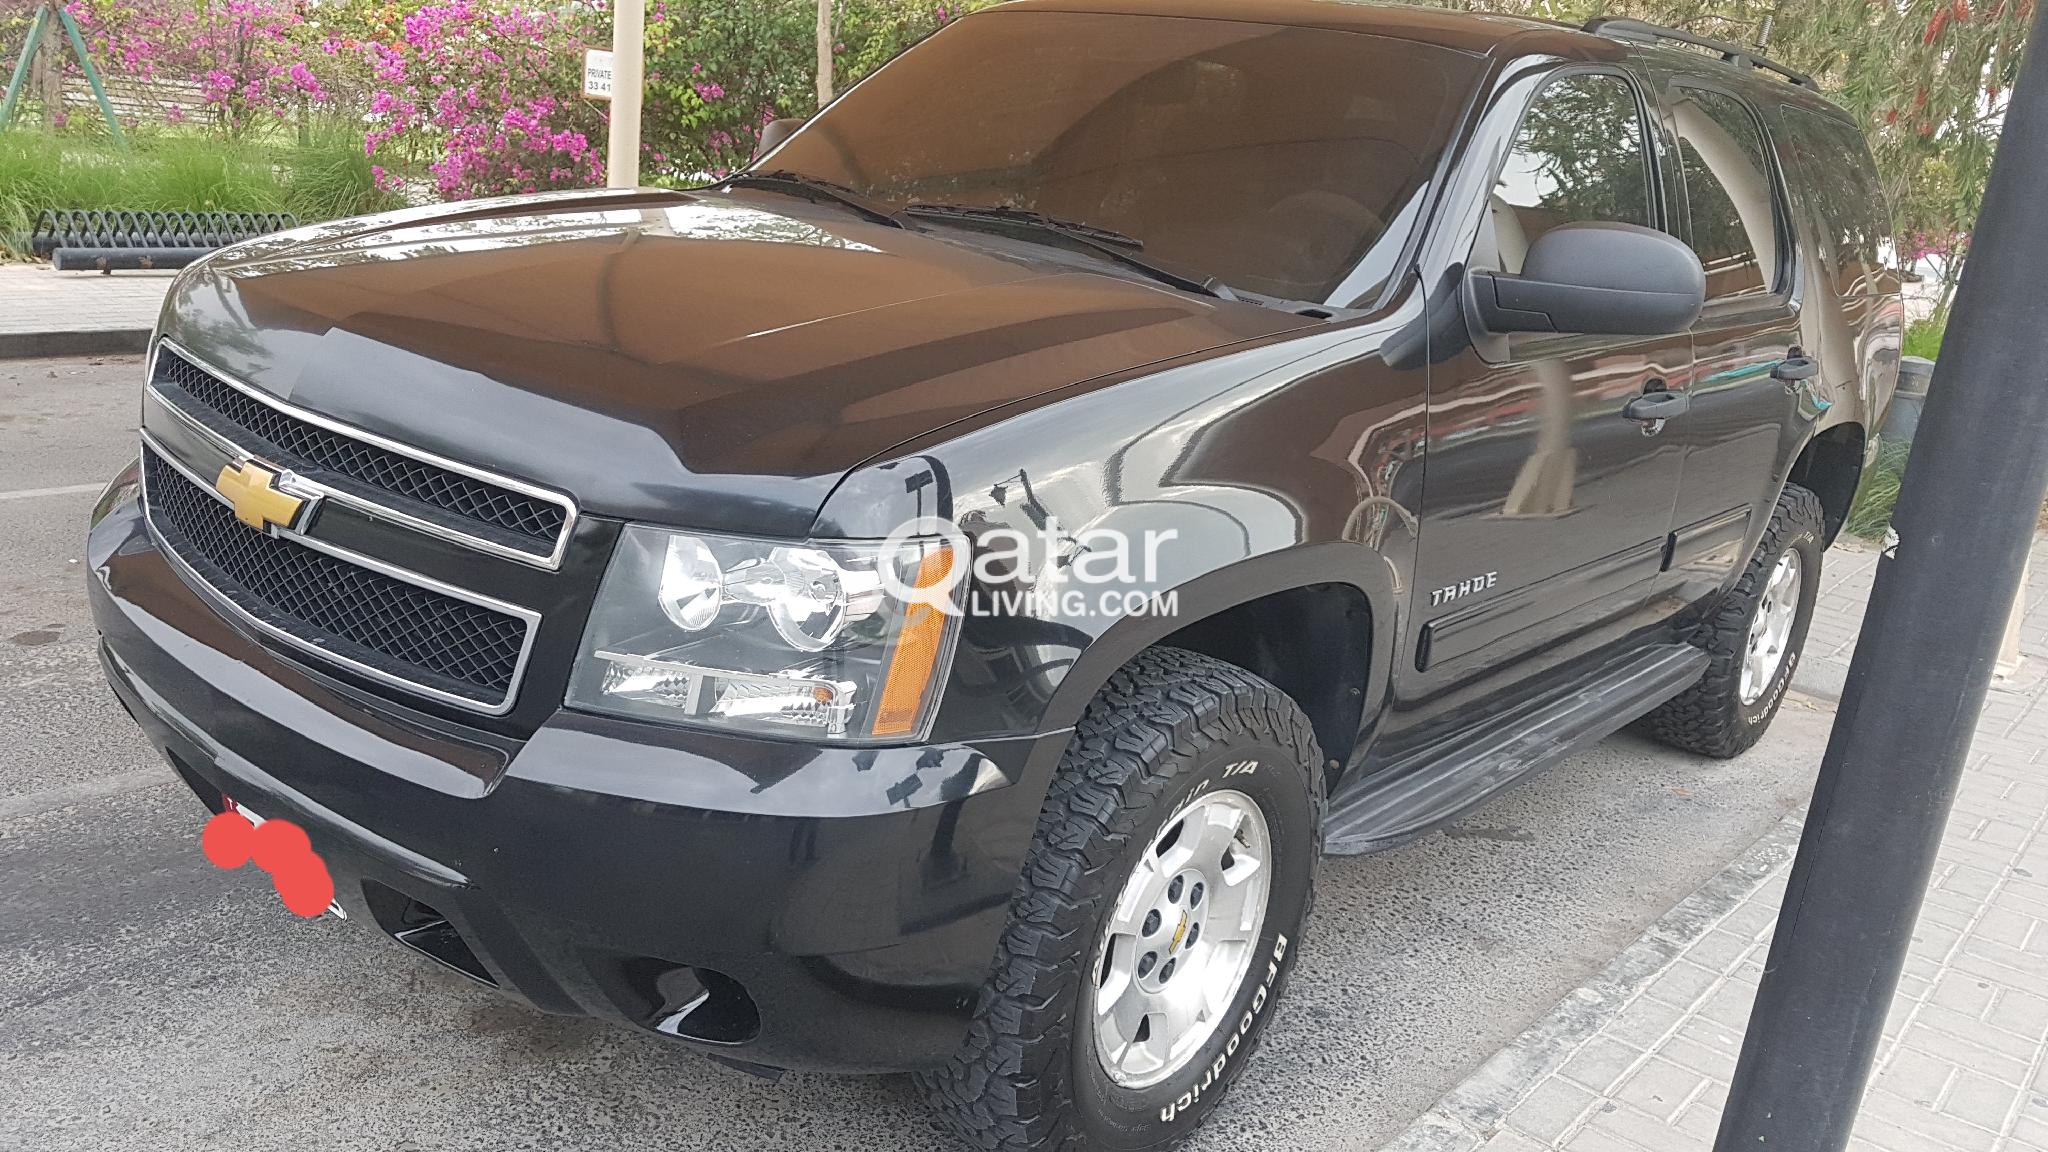 RUSH/IMMEDIATE SALE 2012 Chevy Tahoe LS | Qatar Living